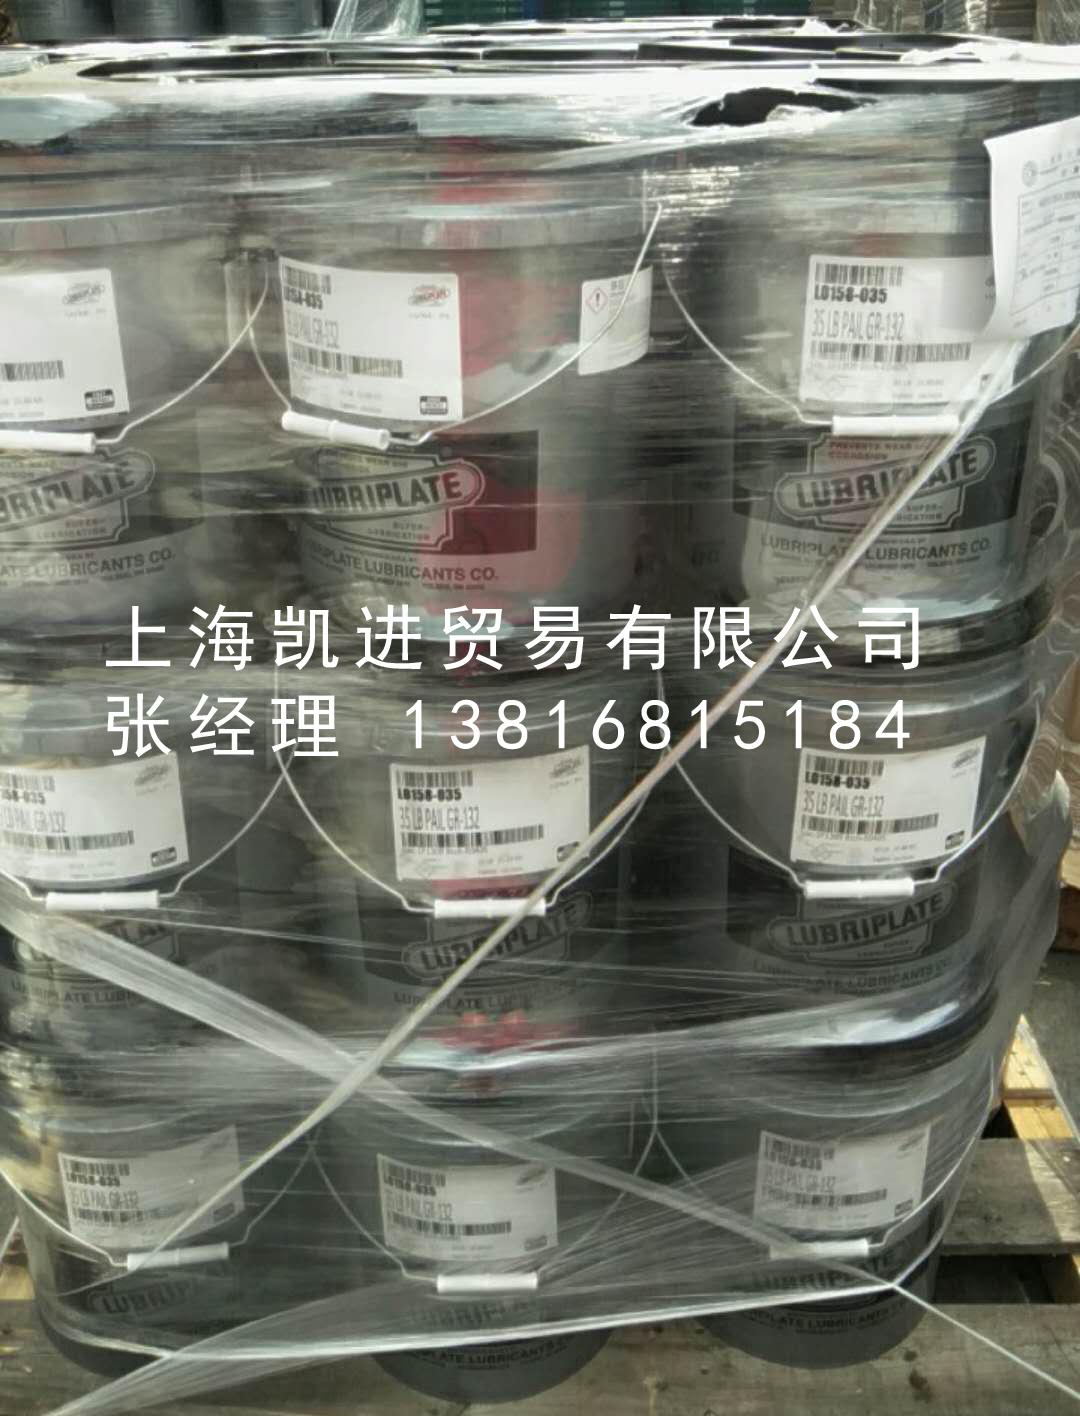 威氏Lubriplate SYN GR 132合成润滑脂